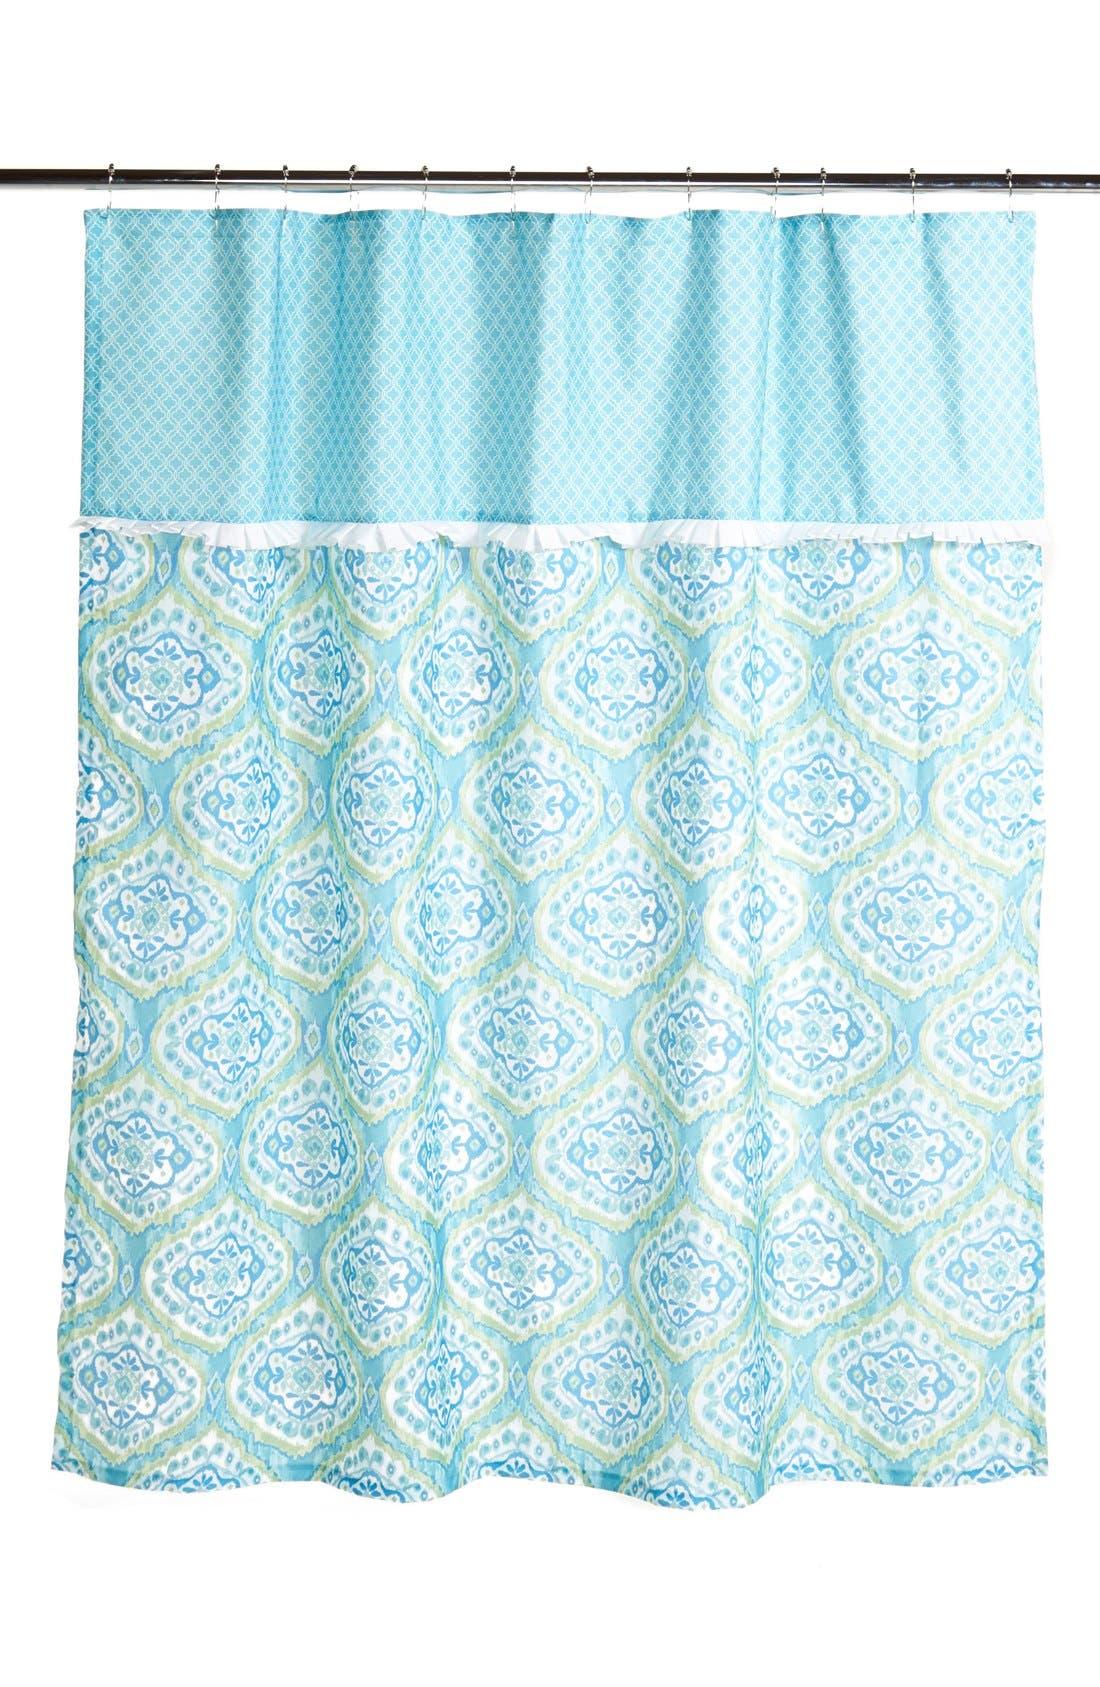 'Tangiers' Shower Curtain,                             Main thumbnail 1, color,                             Aqua